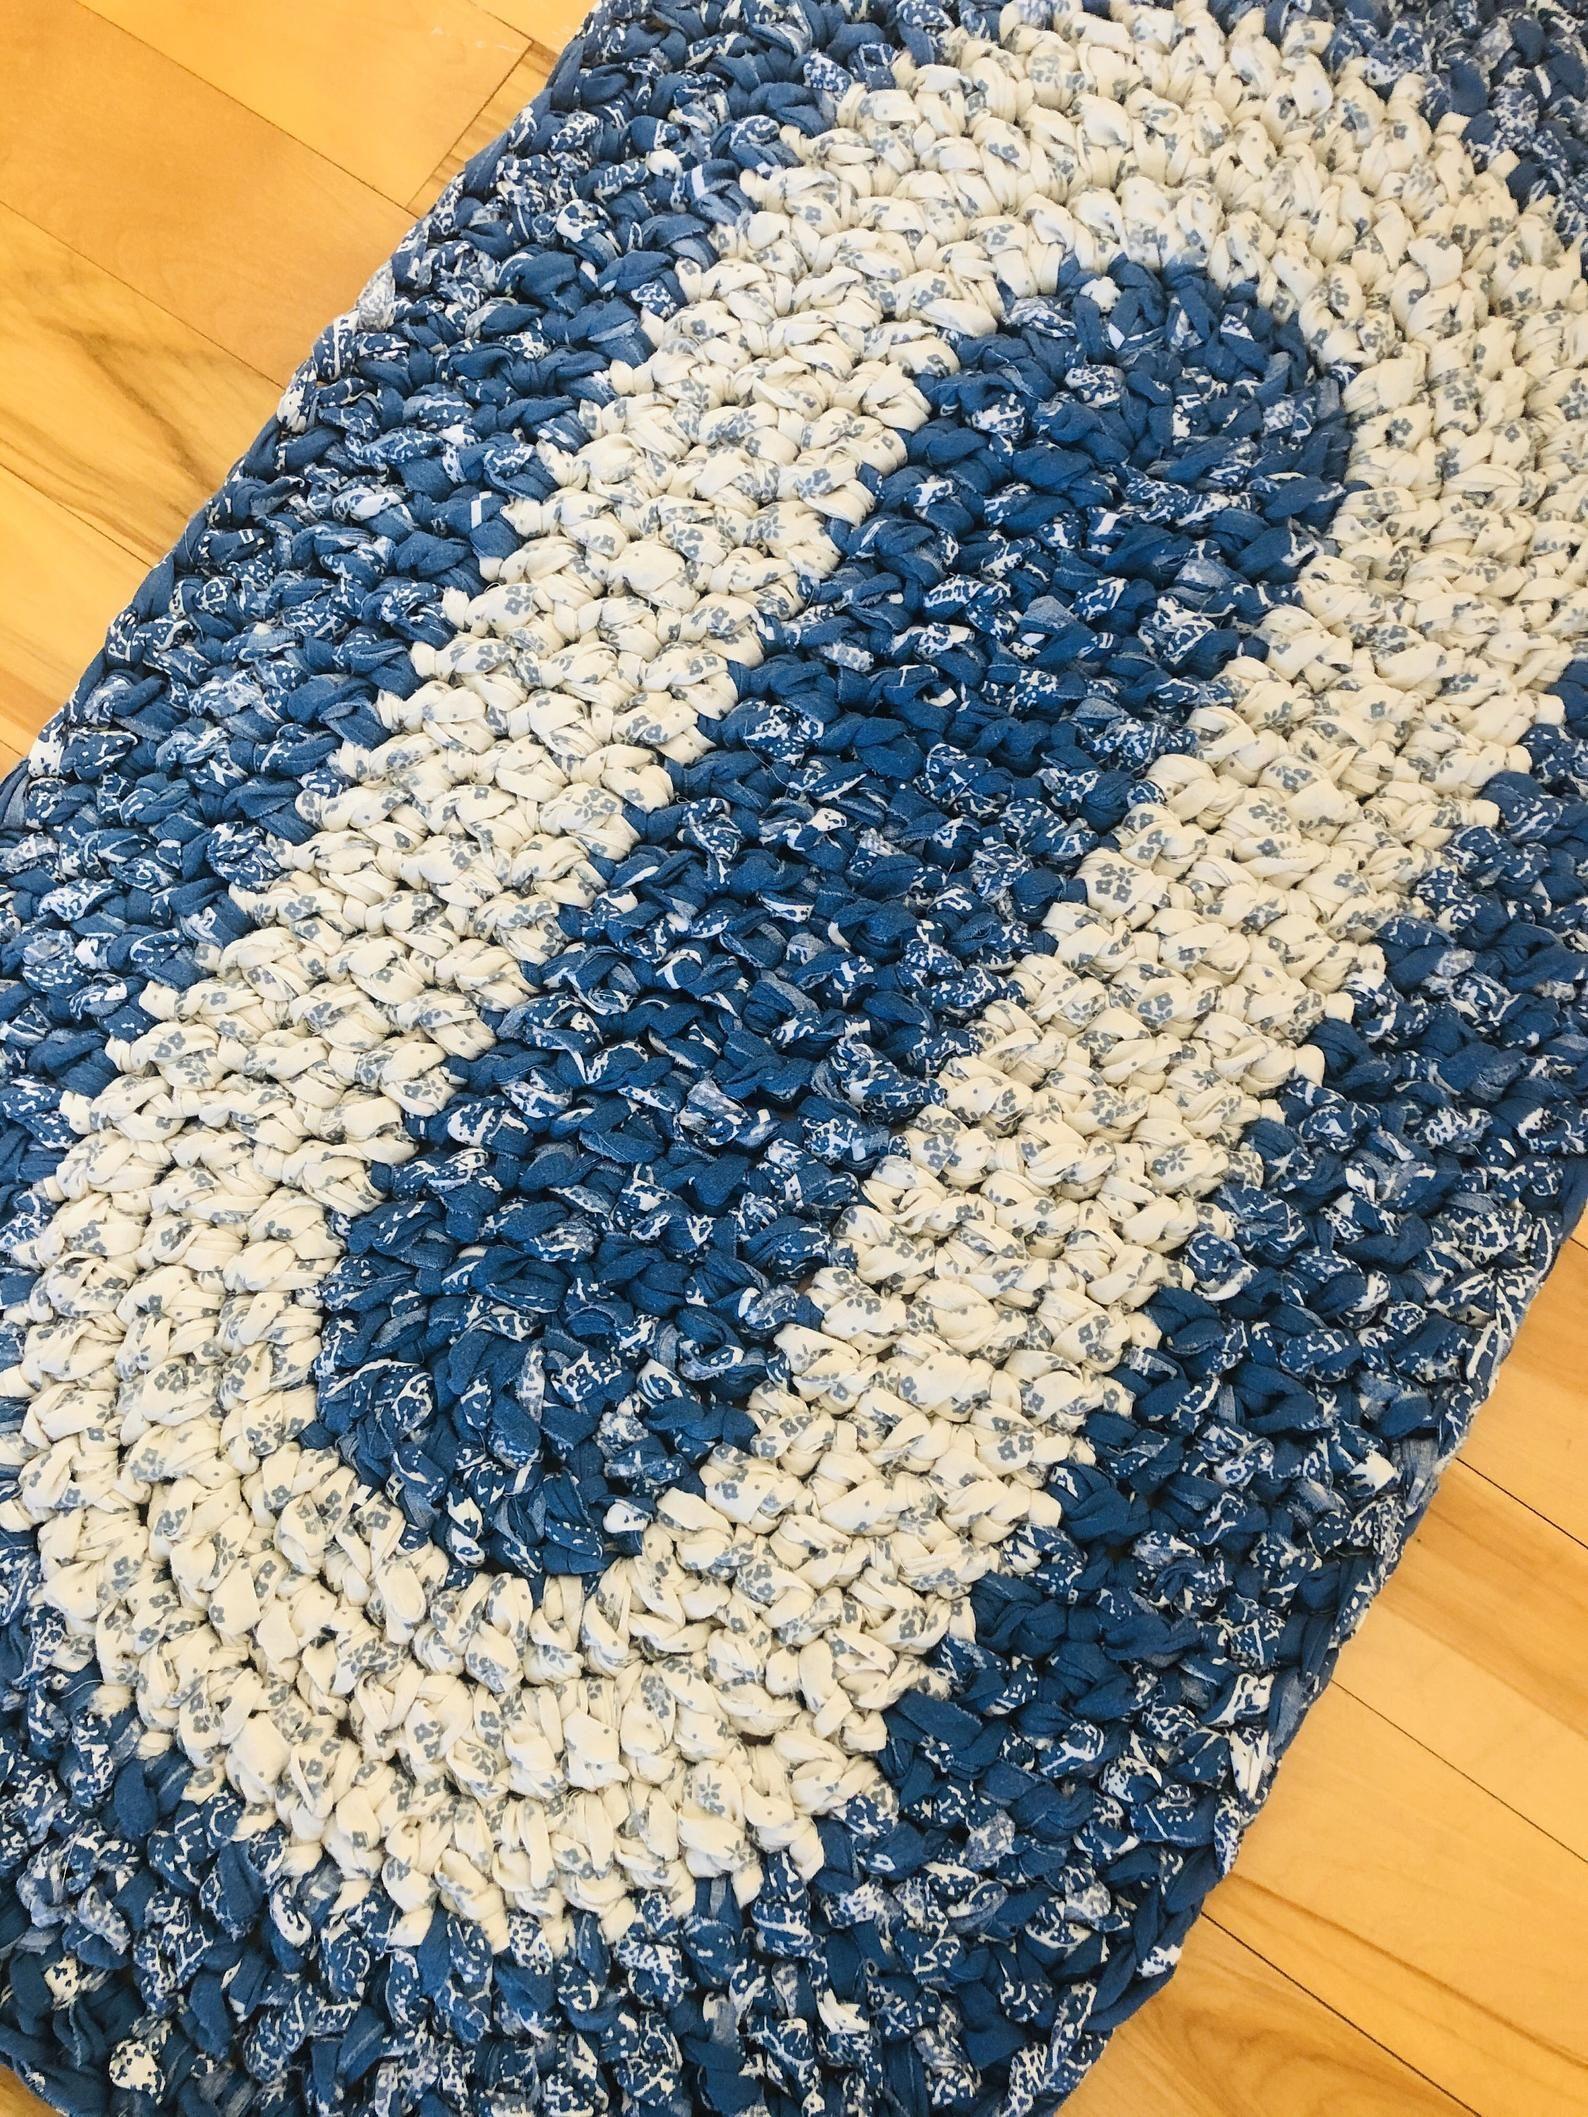 Rag Rug Oval Rug Crochet Rug Blue And White Rug Cabin Rug Farmhouse Rug Cottage Rug Bathroom Rug Nursery R In 2020 Cottage Rugs Blue And White Rug Cabin Rugs